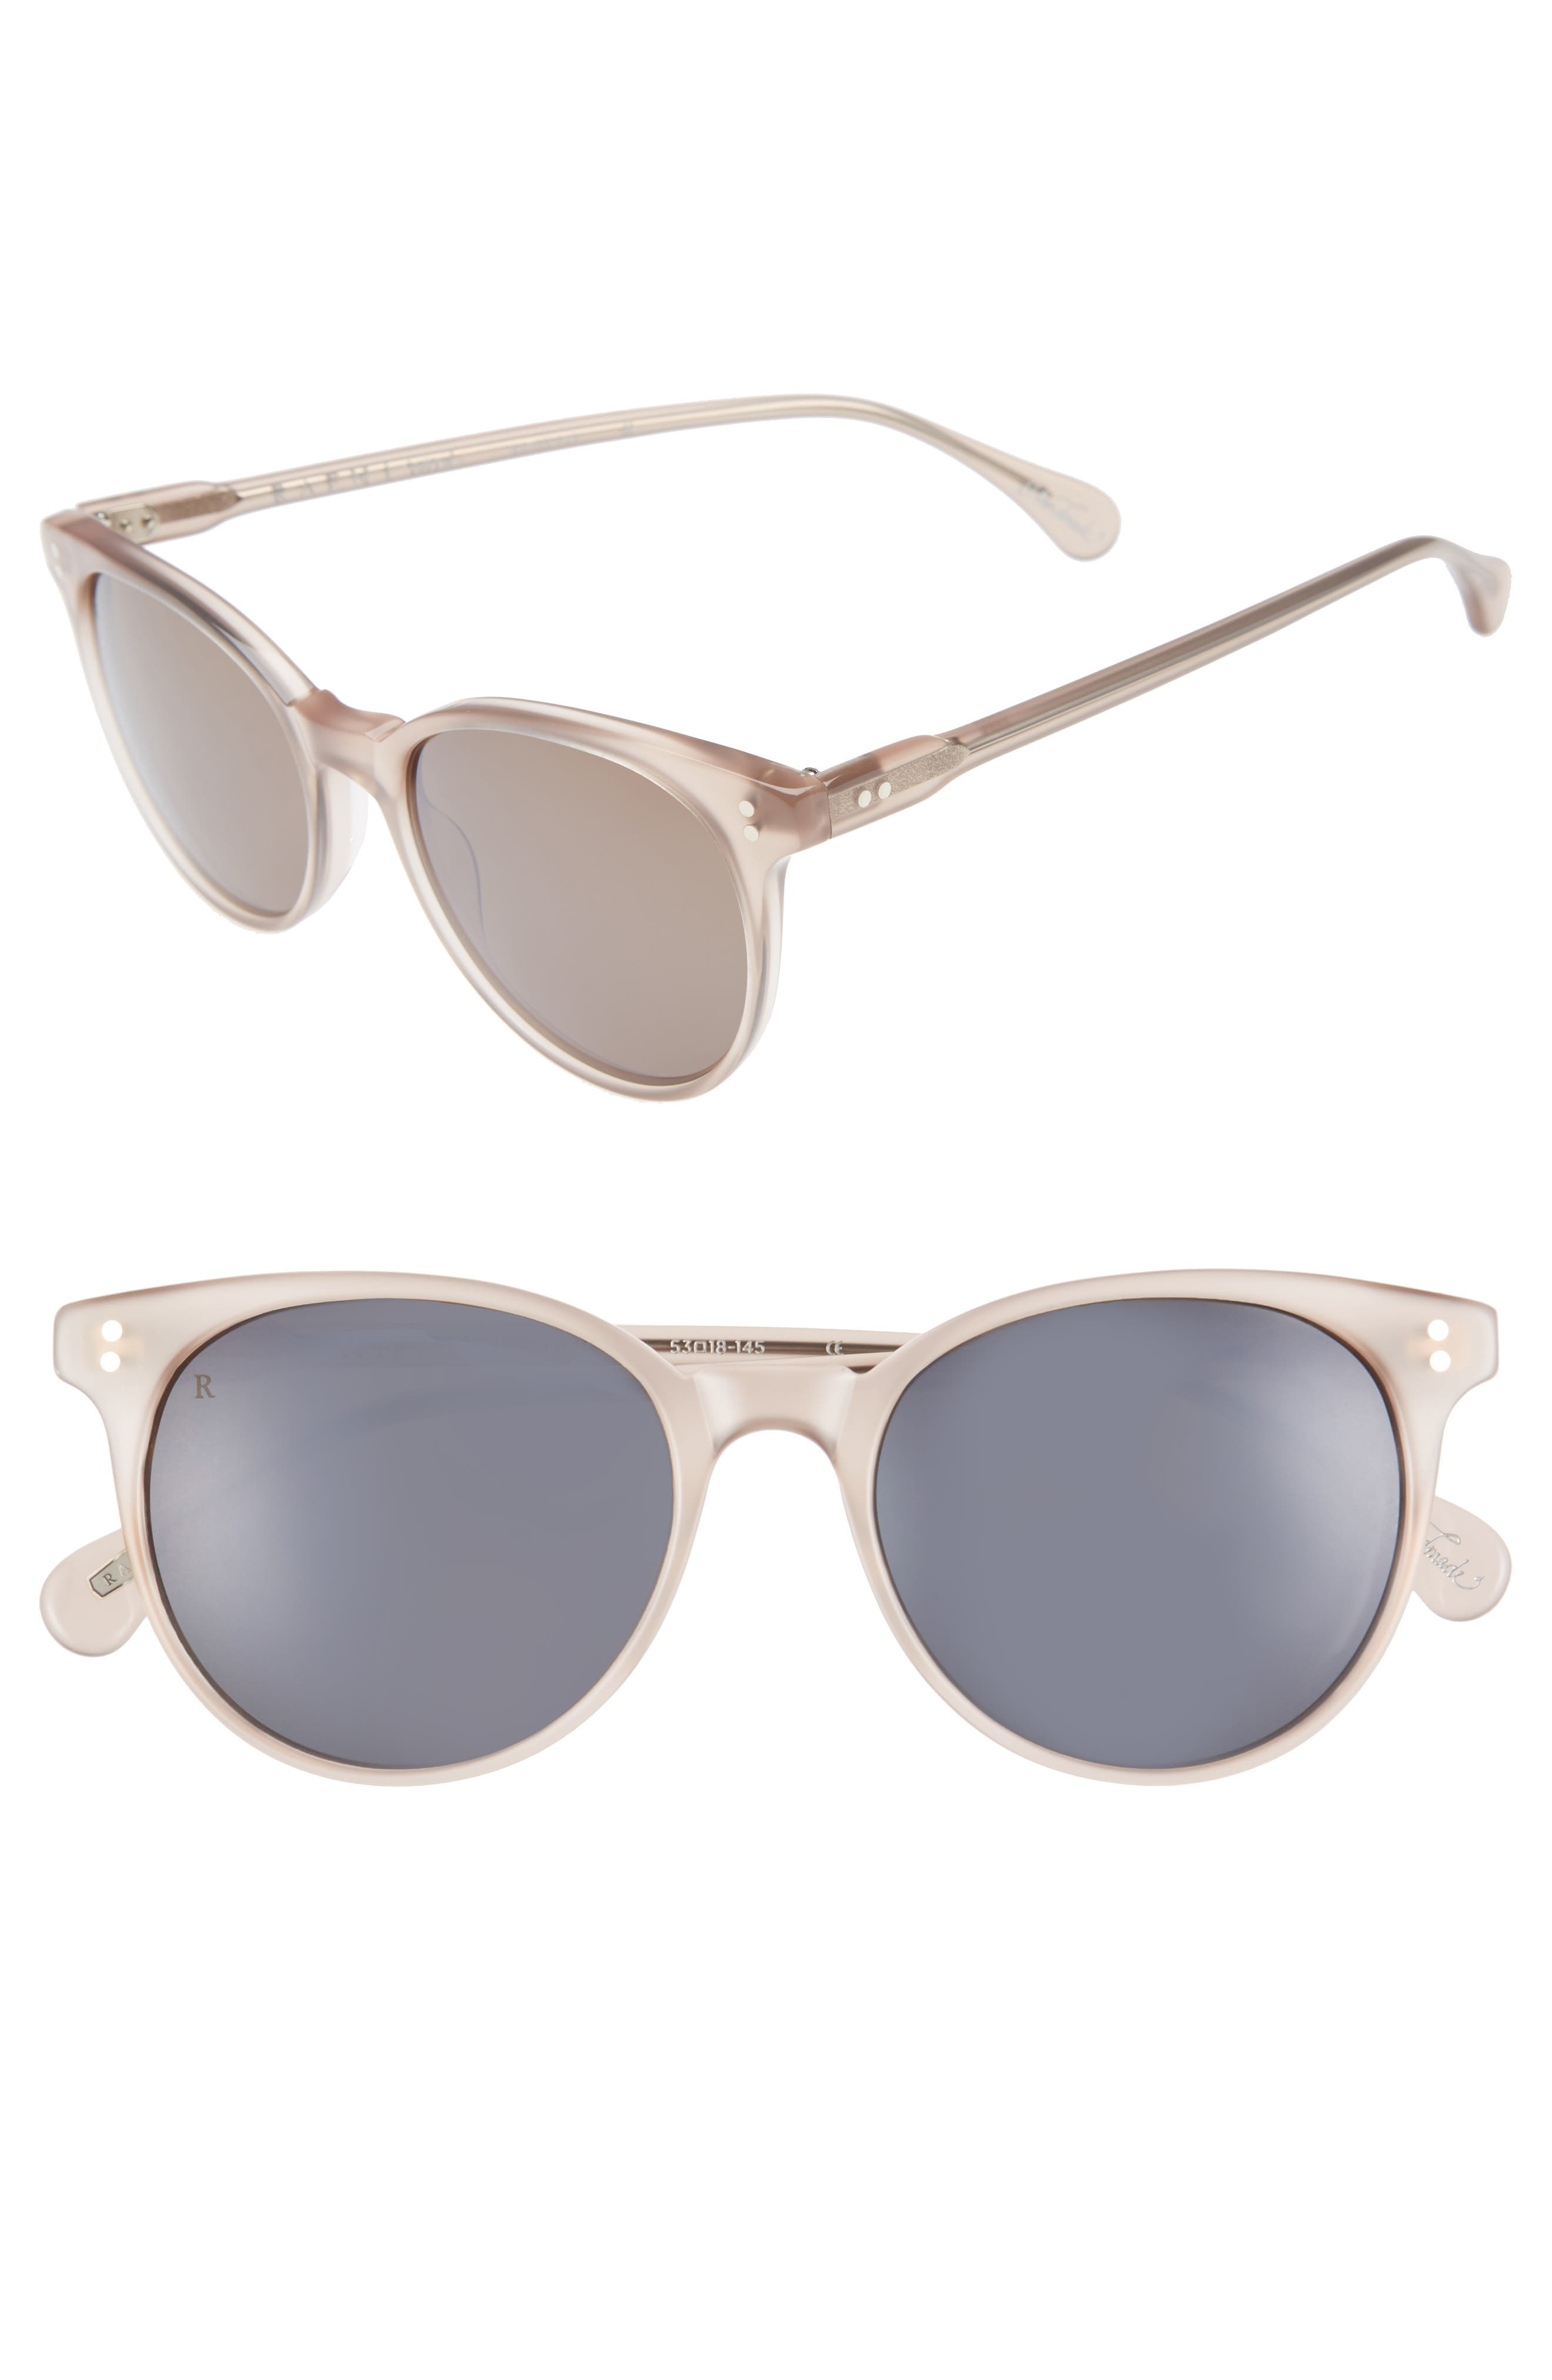 Norie 51mm Cat Eye Mirrored Lens Sunglasses,                             Main thumbnail 1, color,                             FLESH